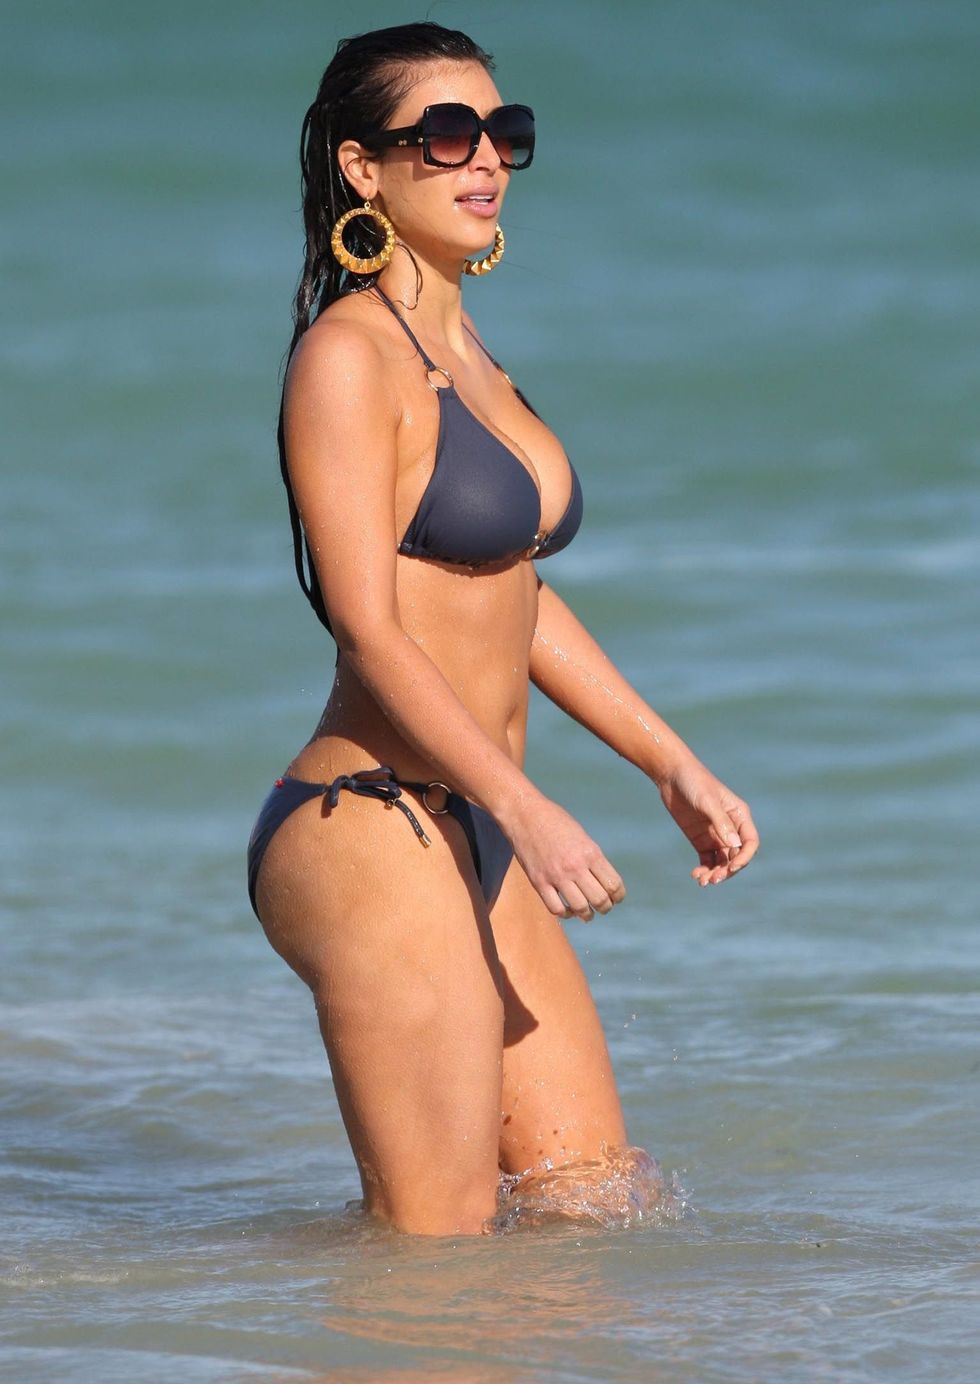 Pics of: Kim Kardashian